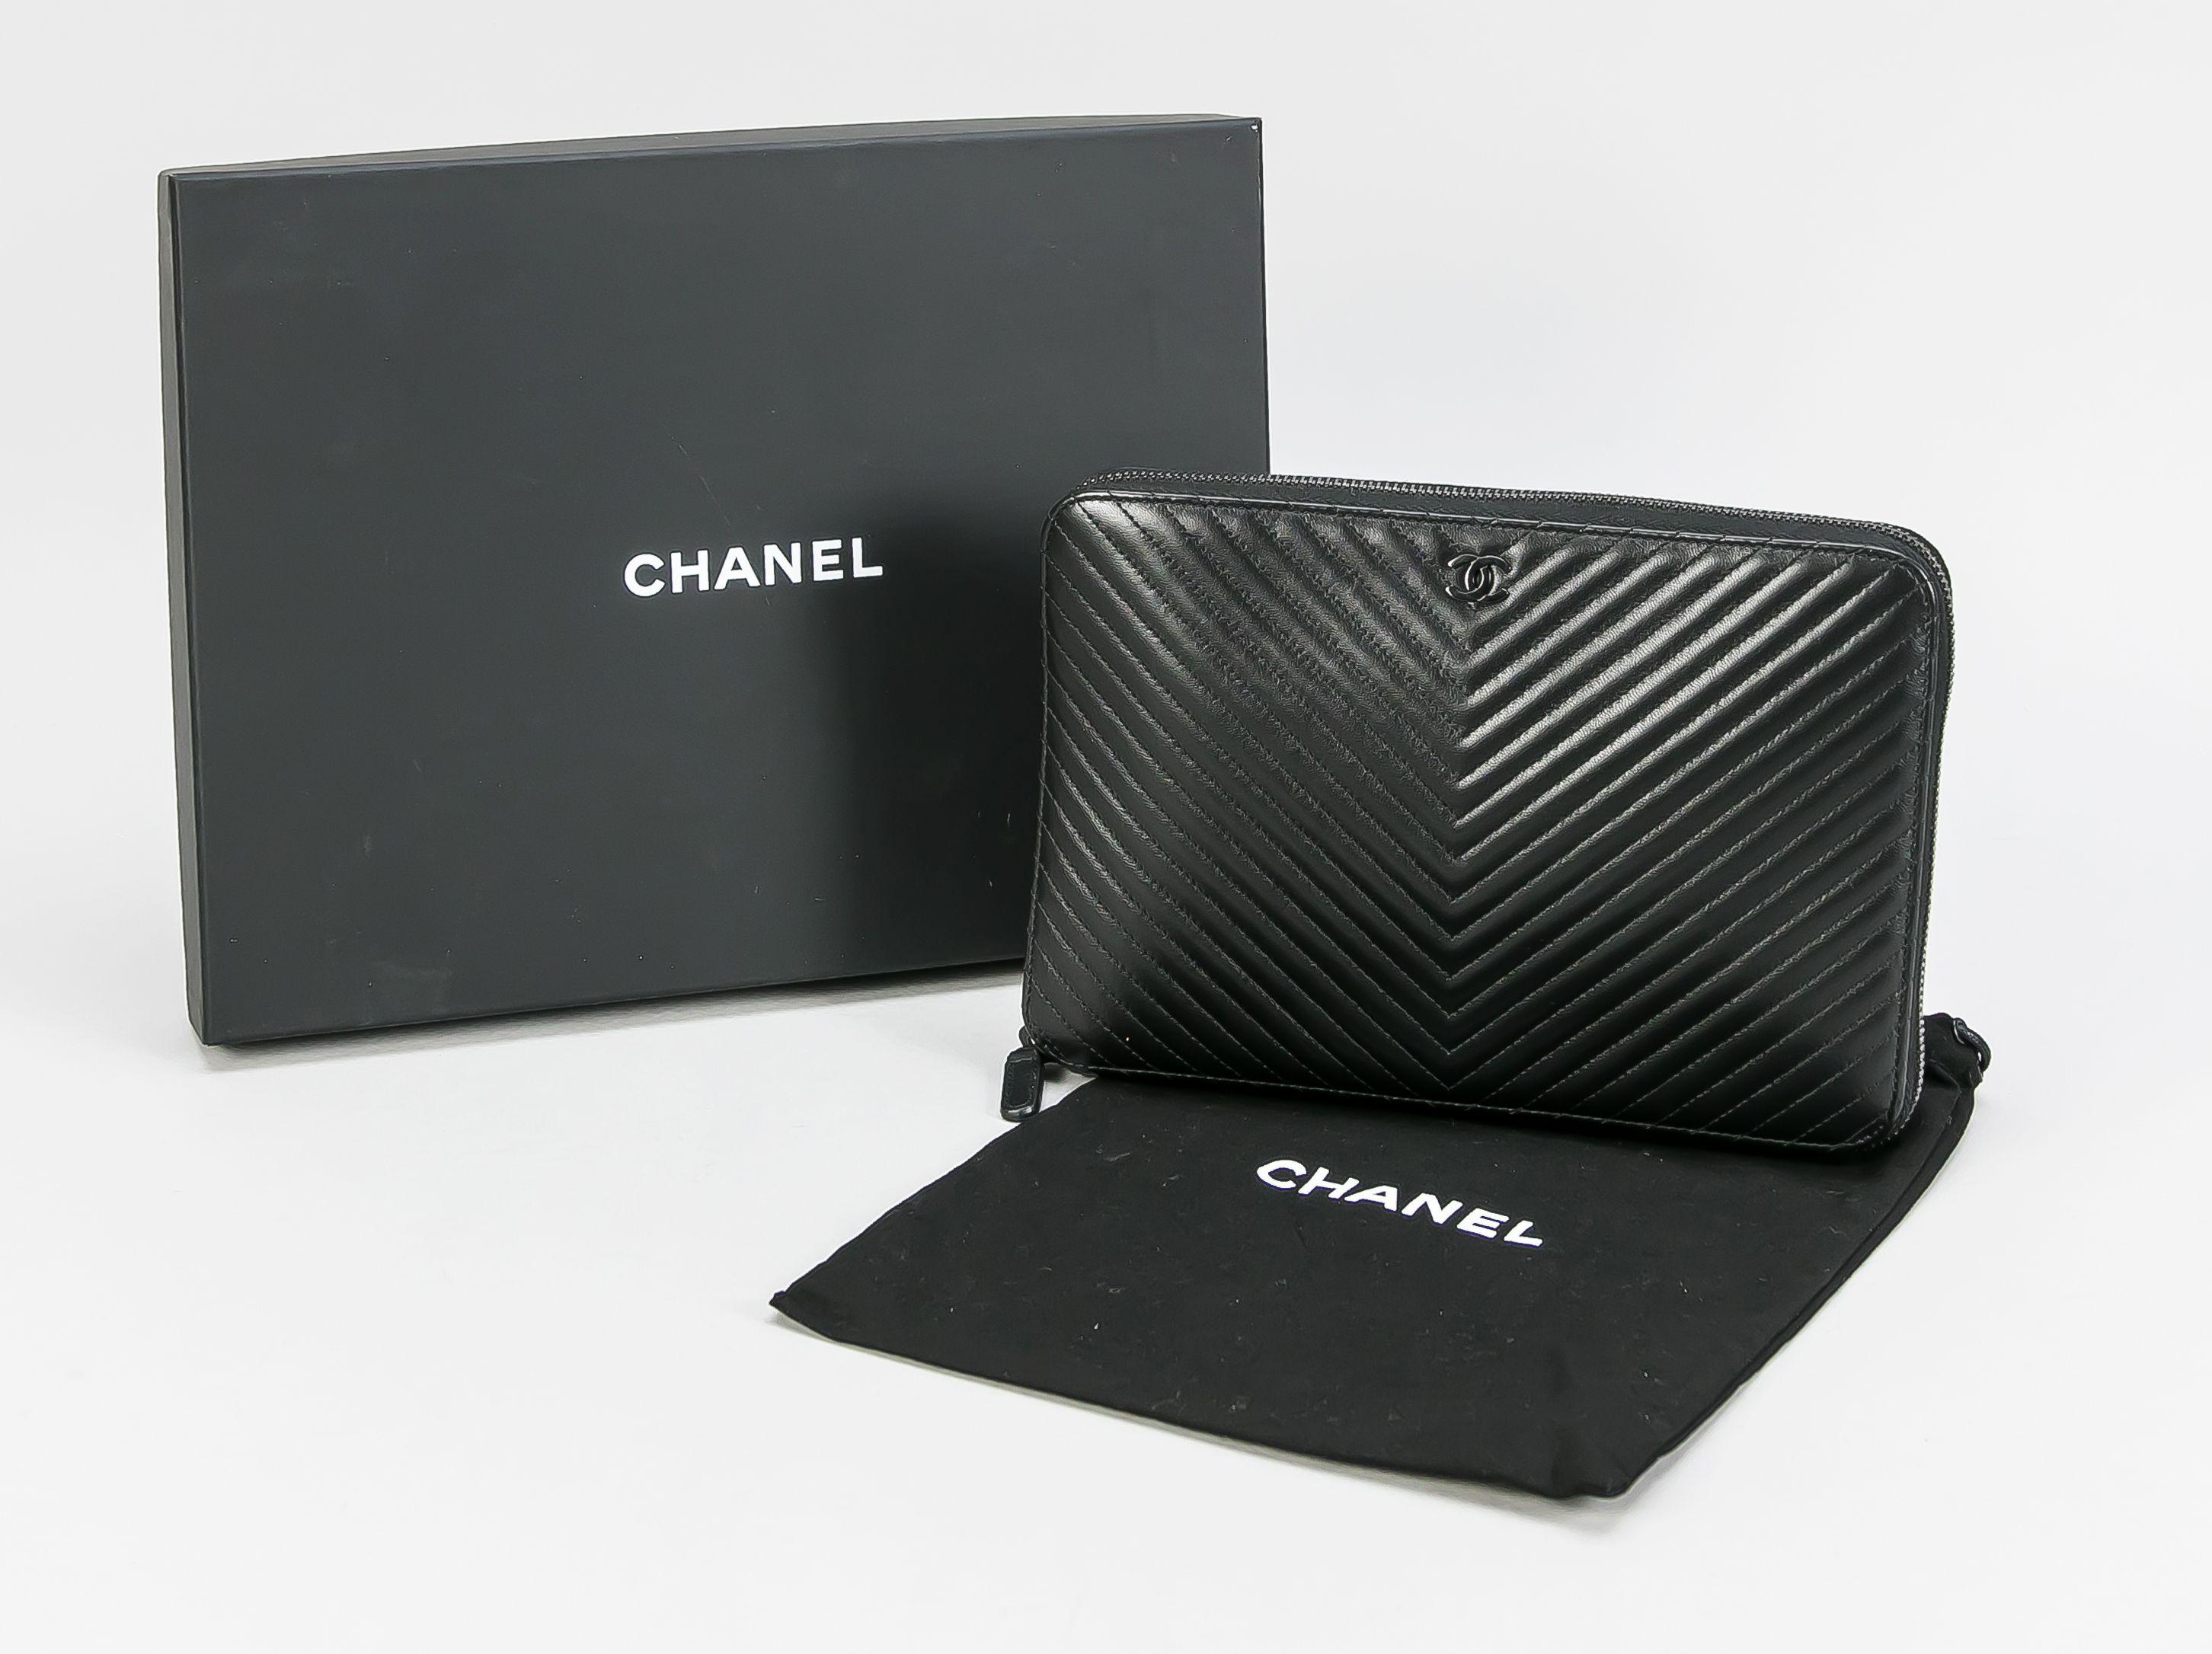 Chanel Black 16c Leather Slingbacks Eu 37 Pumps Size US 7